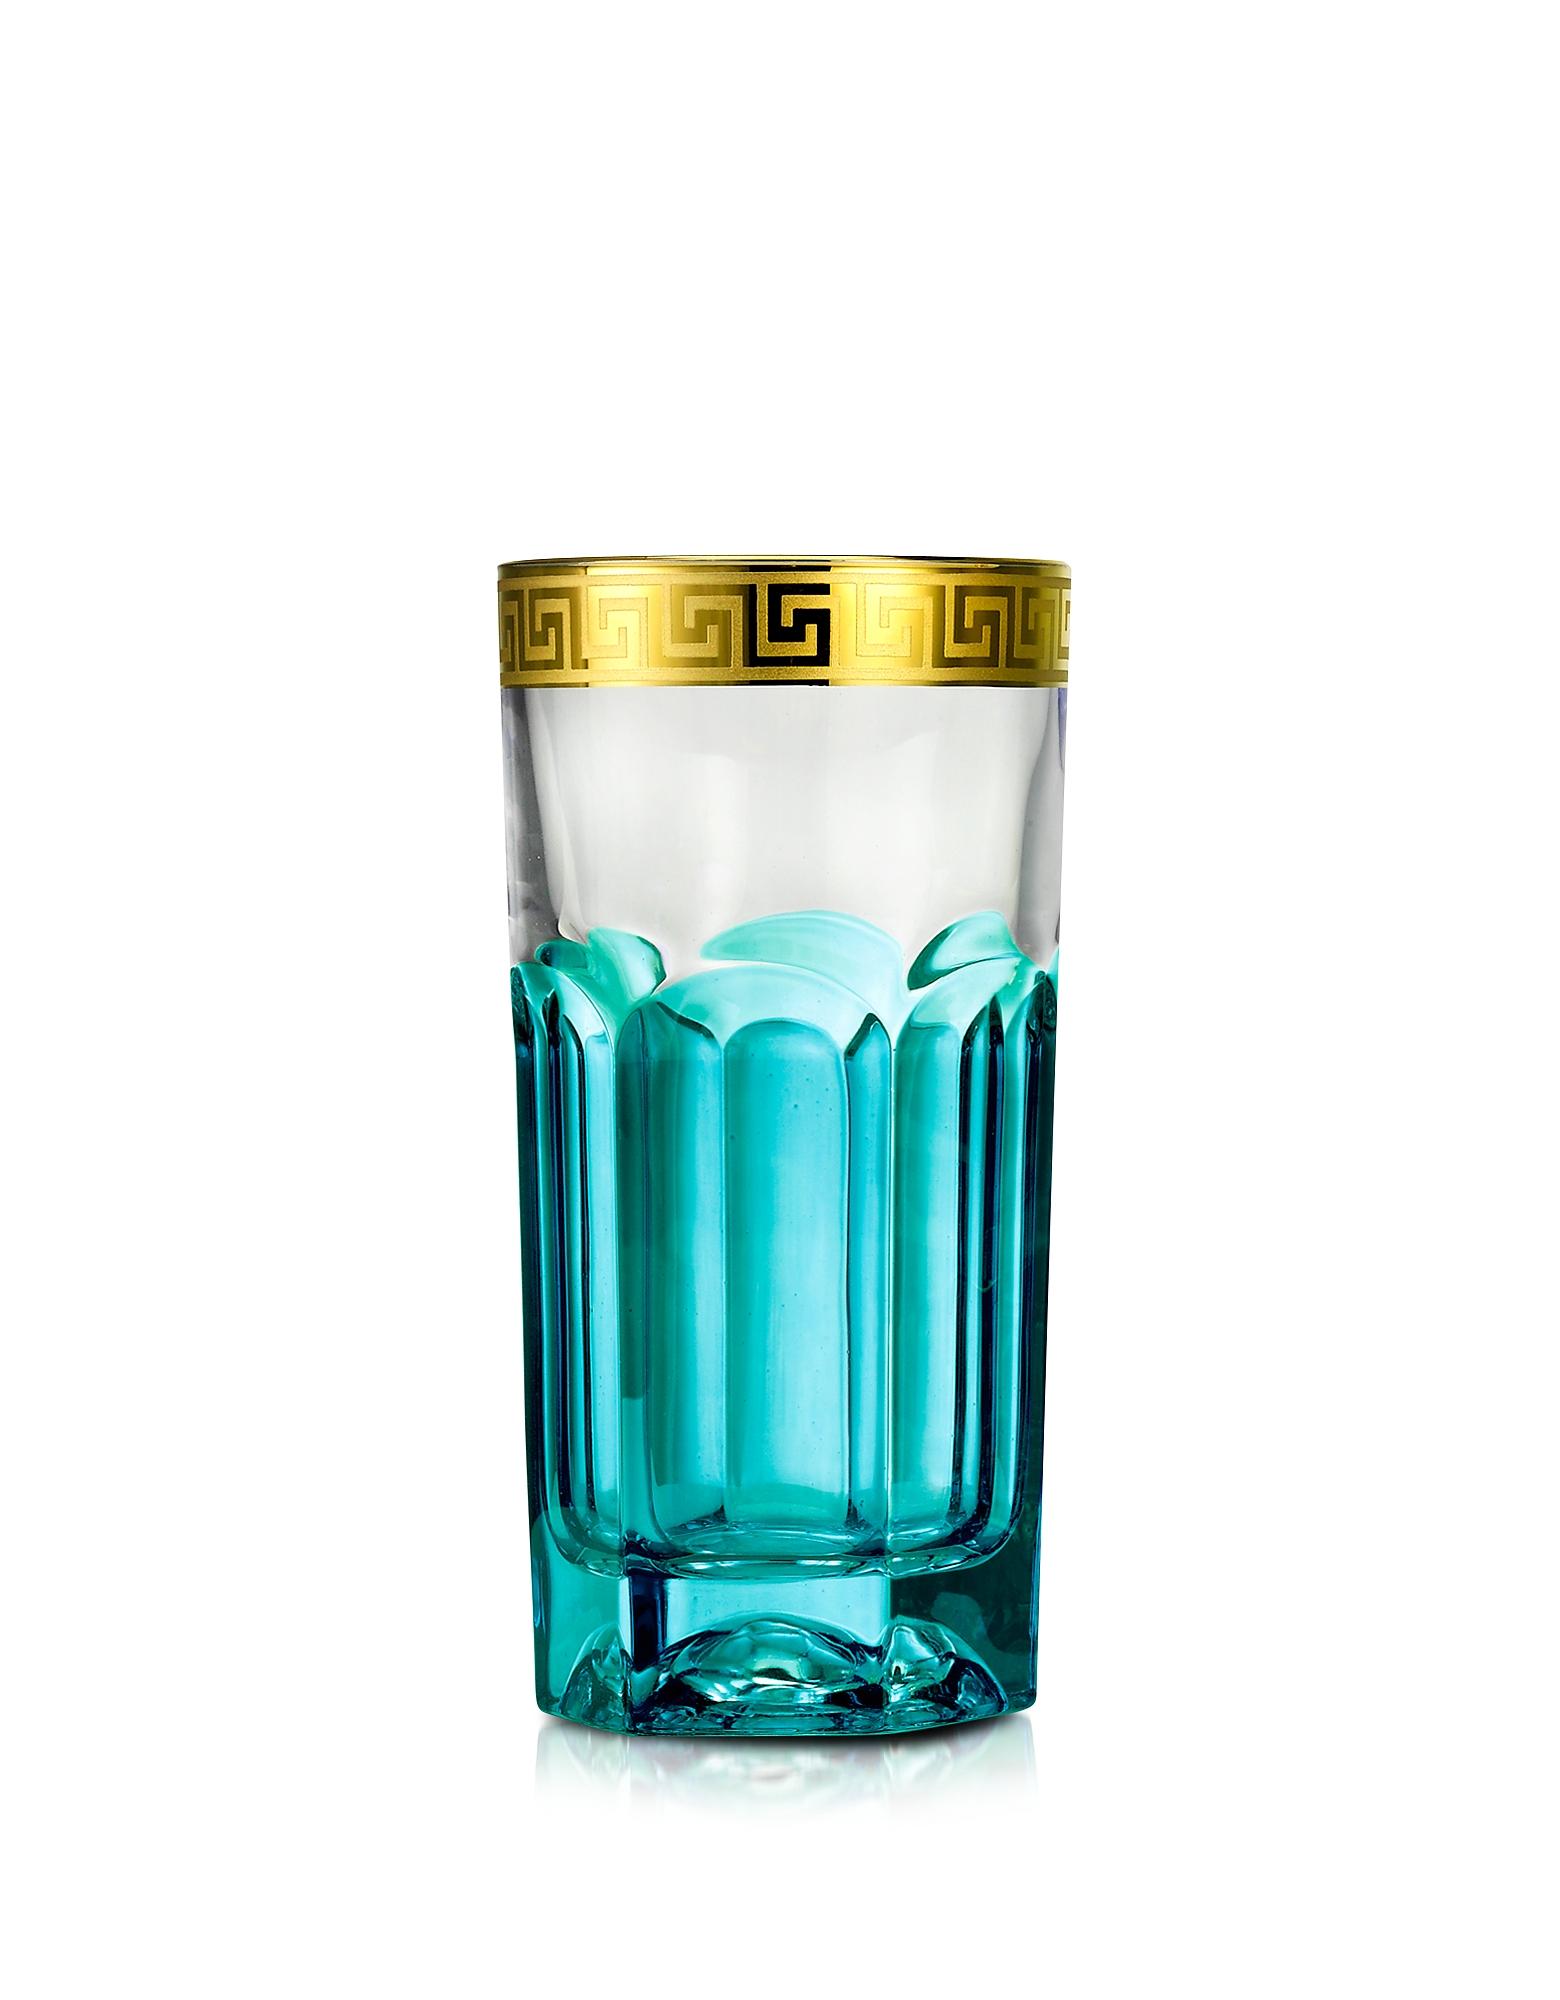 Forzieri Designer Kitchen  Dining Zecchin Set of 6 Juice Glasses